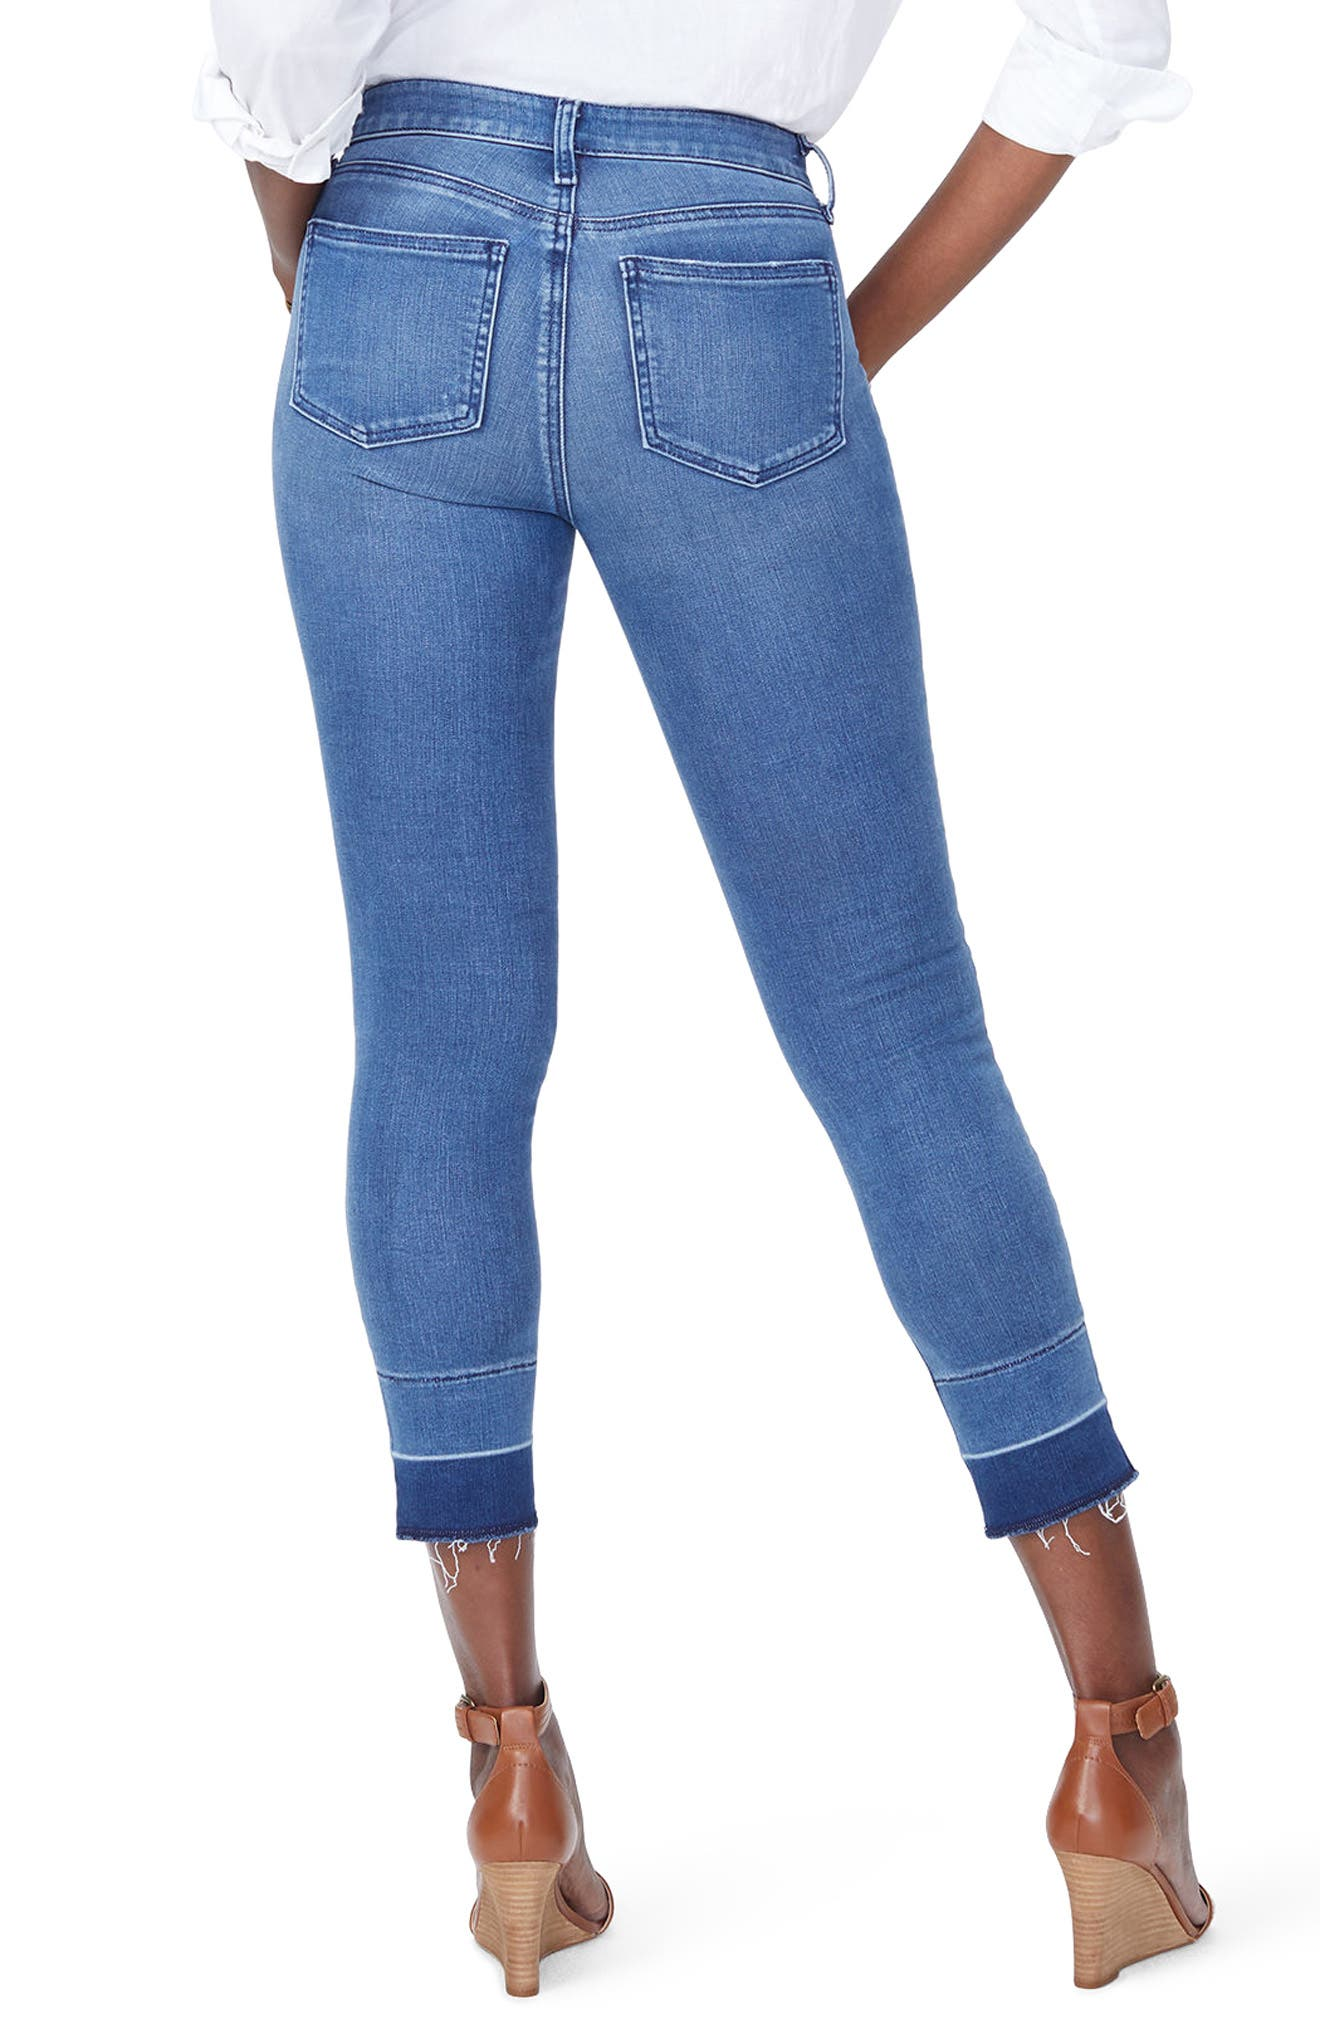 Alina Release Hem Ankle Skinny Jeans,                             Alternate thumbnail 3, color,                             Wishful